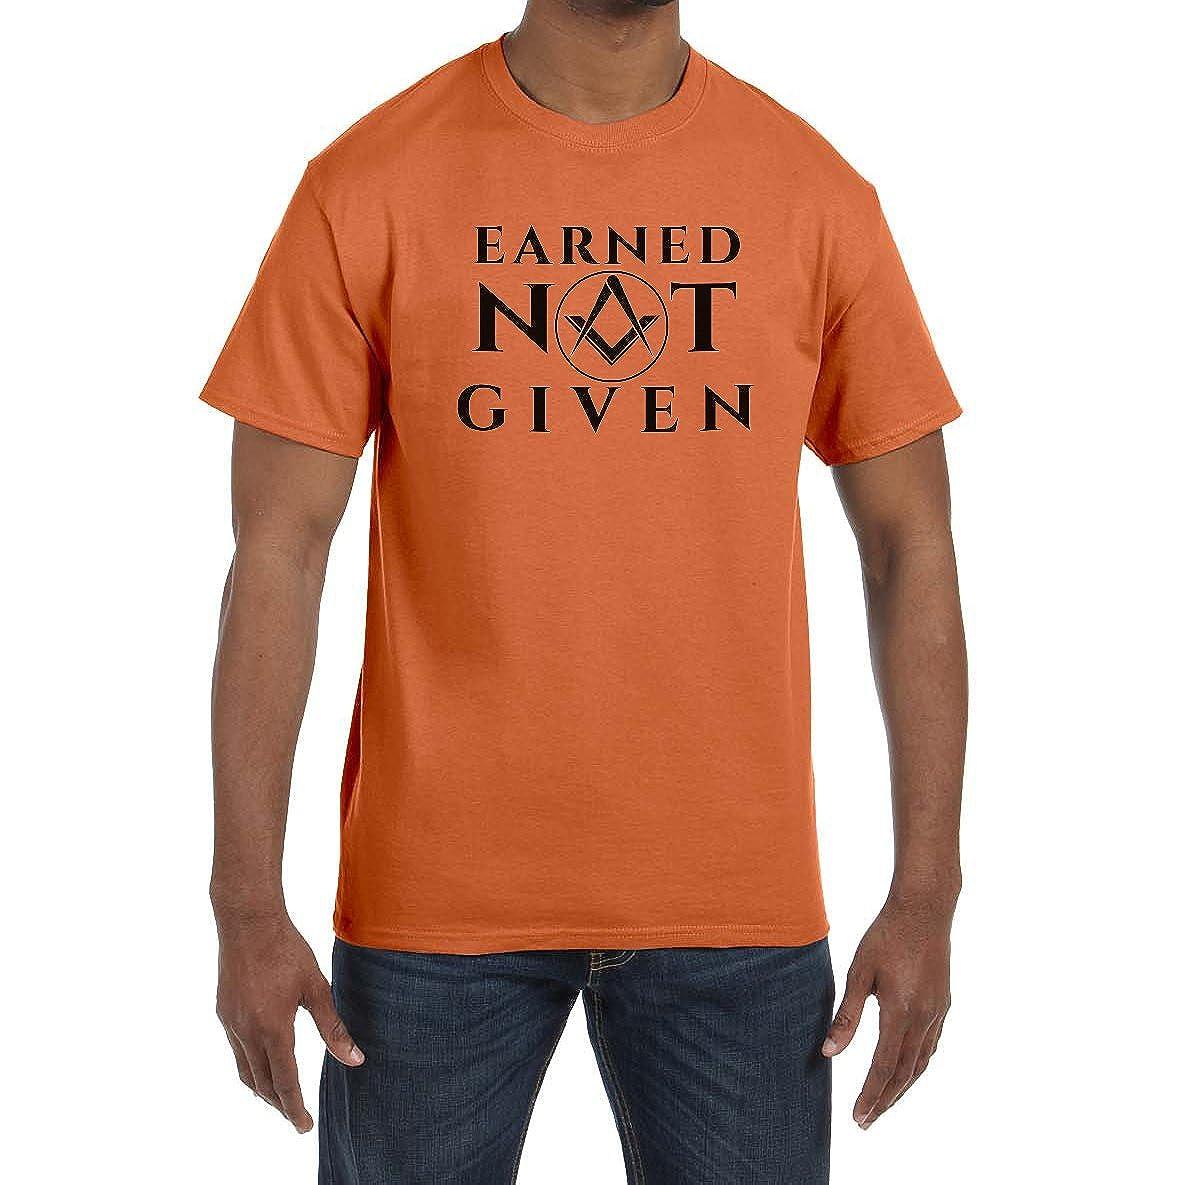 Earned Not Given Masonic Mens Crewneck T-Shirt